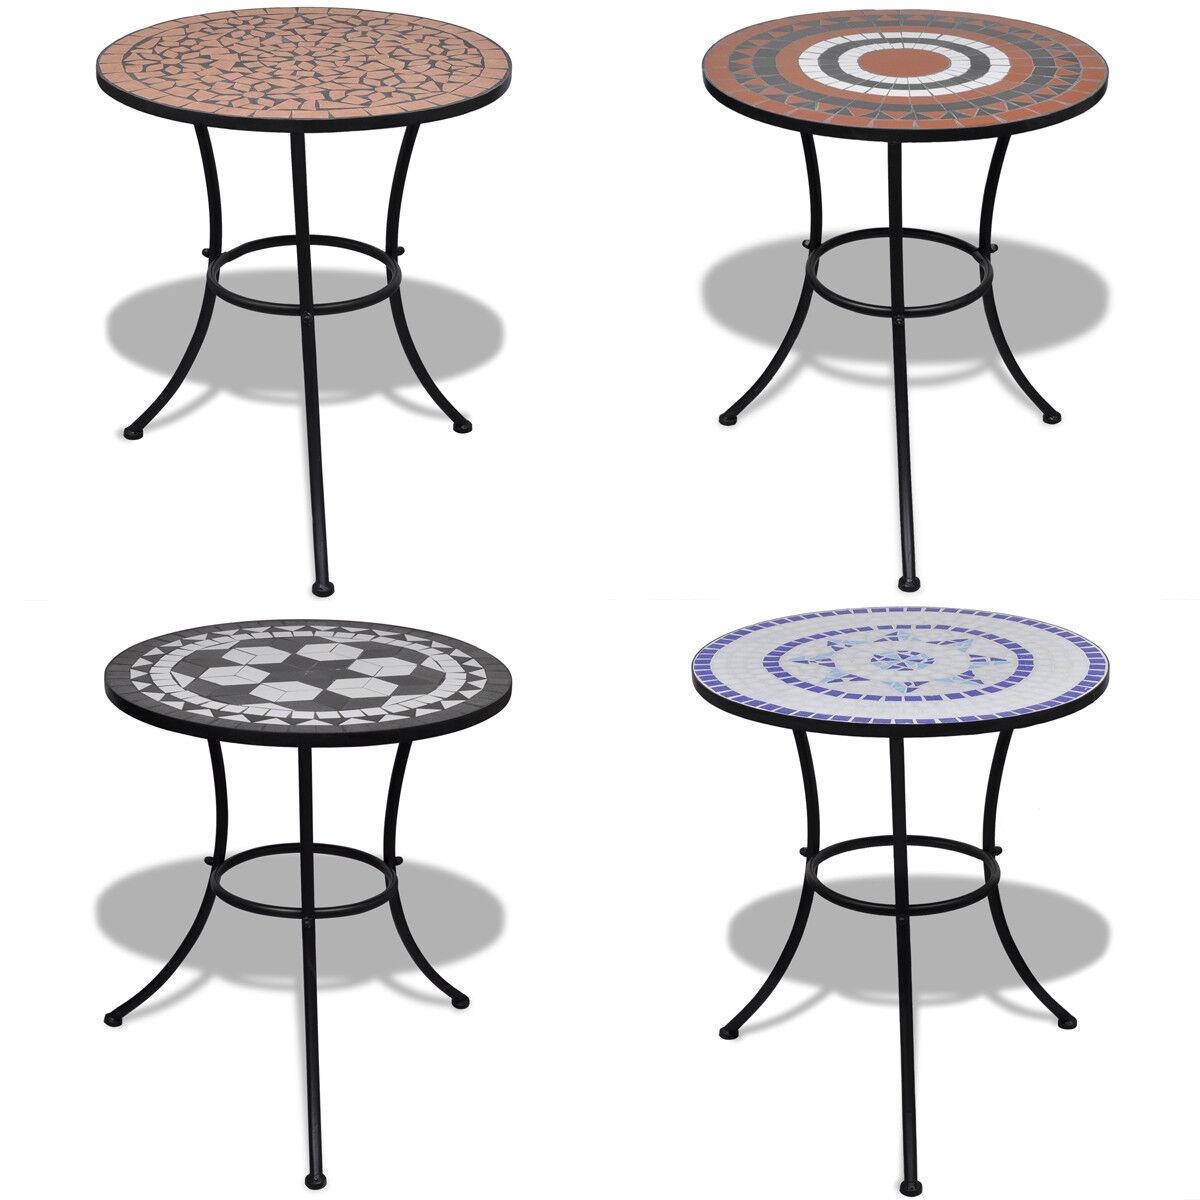 VidaXL Mesa Tipo Mosaico Cerámica Diámetro 60 cm Disponible Diferentes Colors